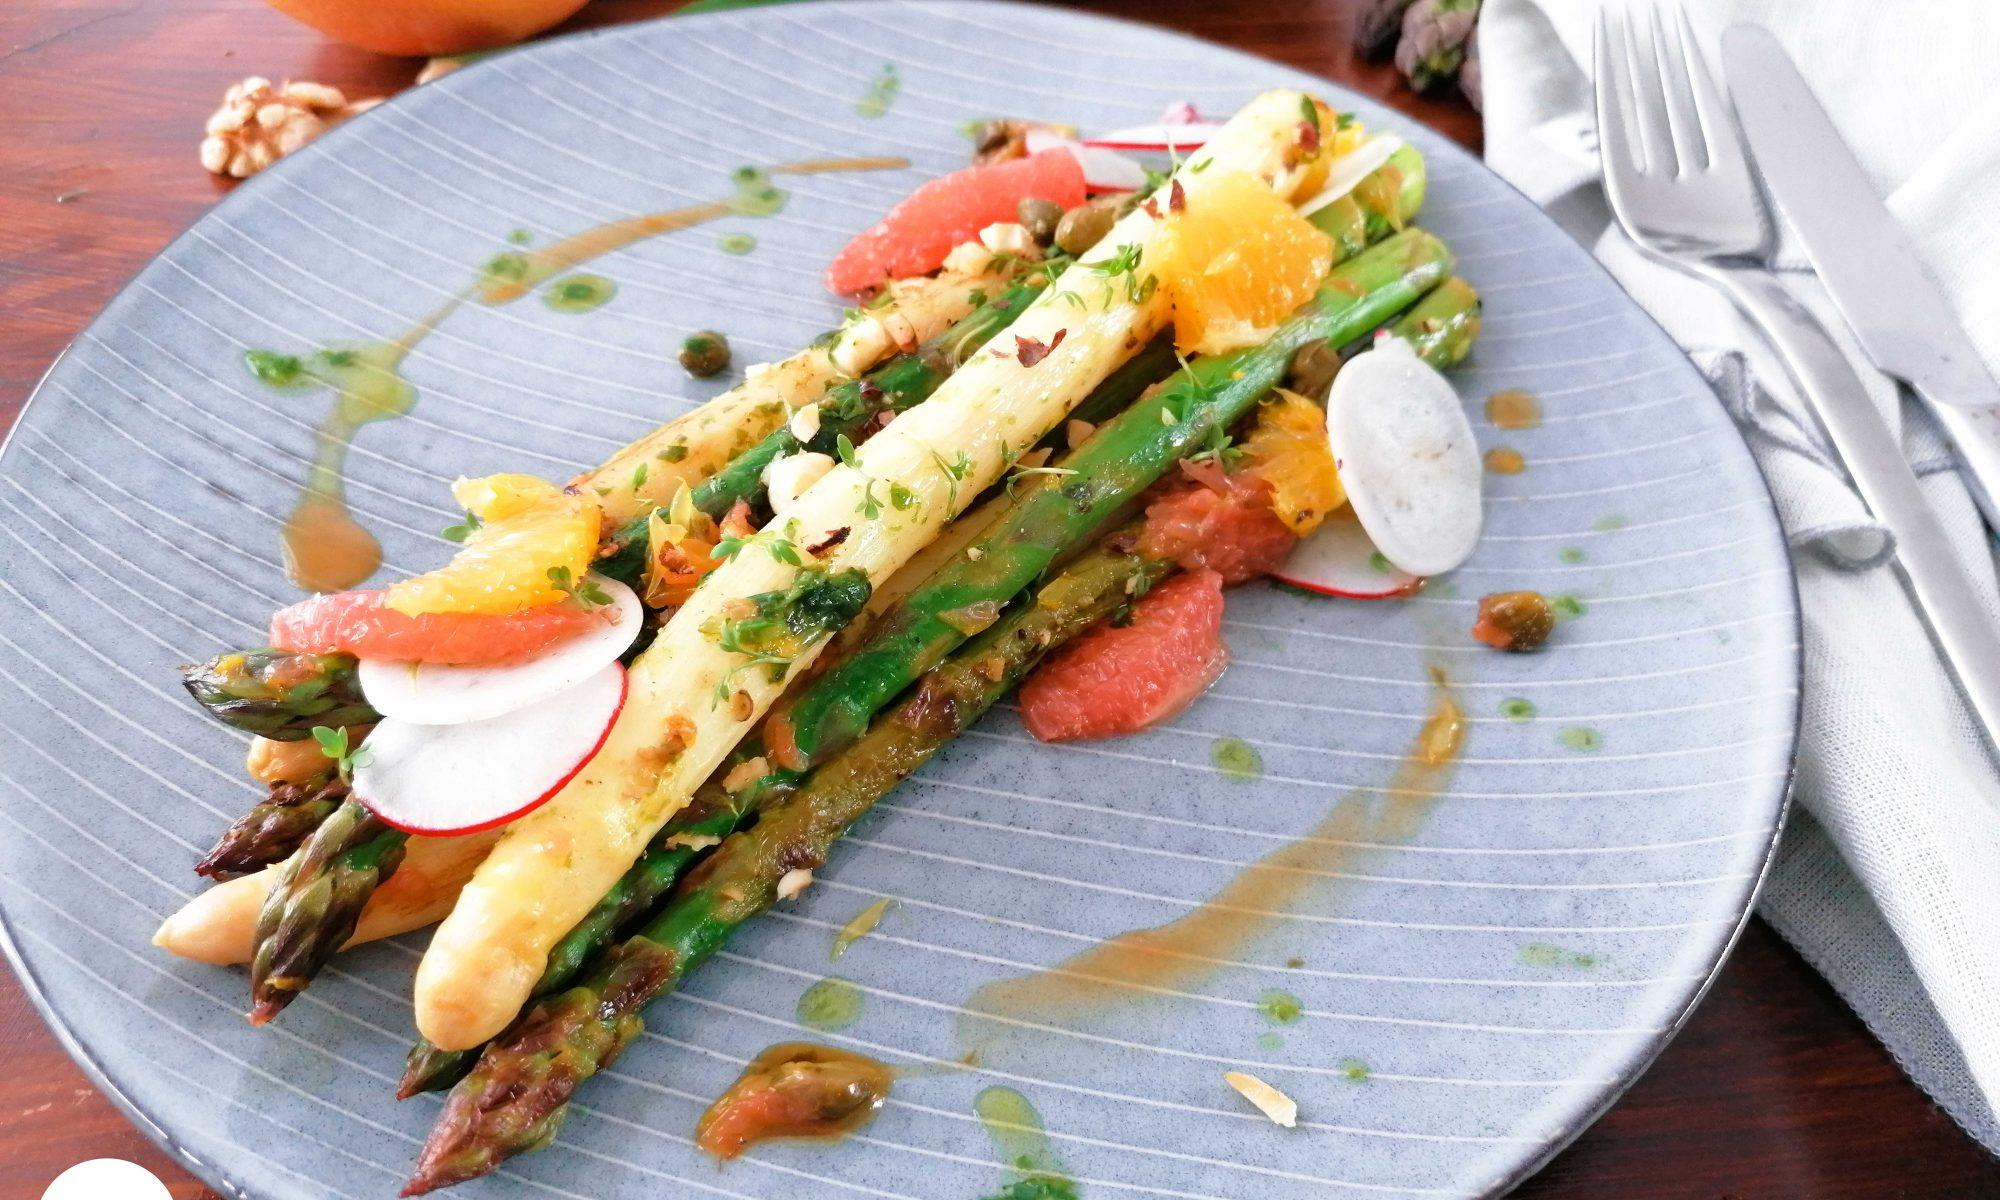 Spritziger Fruehlingscrush - Der Spargelsalat Queer Cooking mit franzi cooks 1